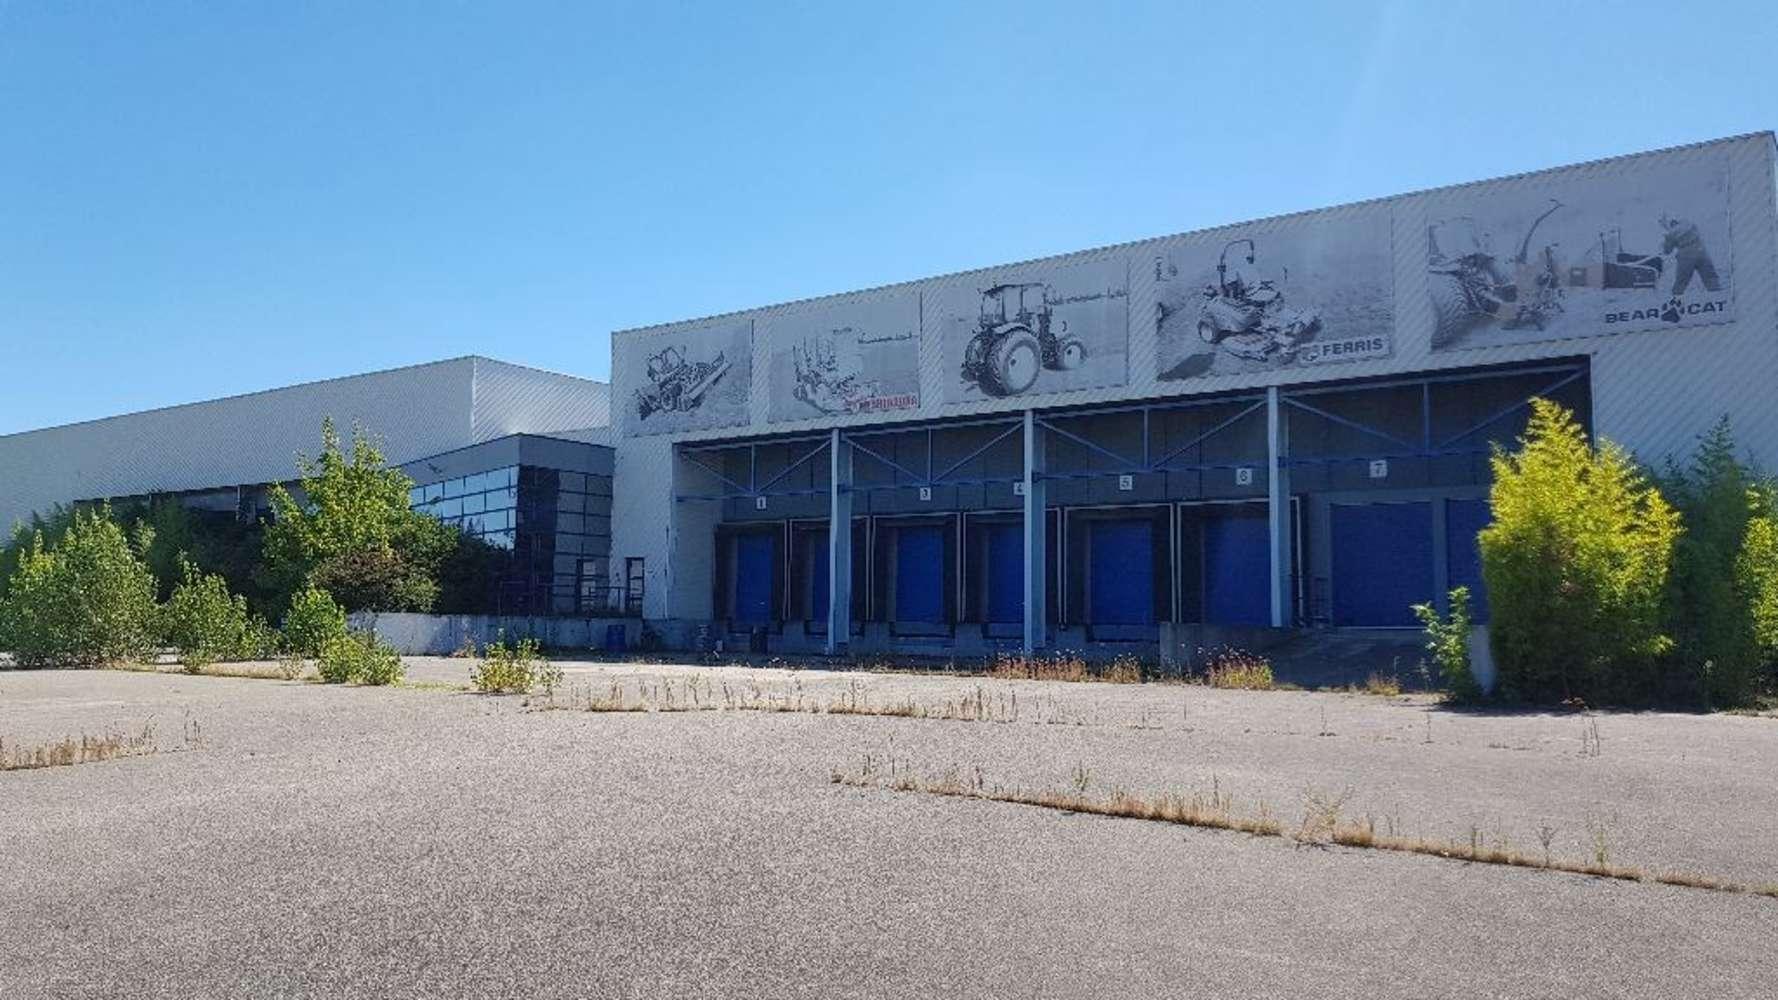 Activités/entrepôt Vaulx milieu, 38090 - Entrepot à vendre Lyon - Vaulx Milieu - 10471418